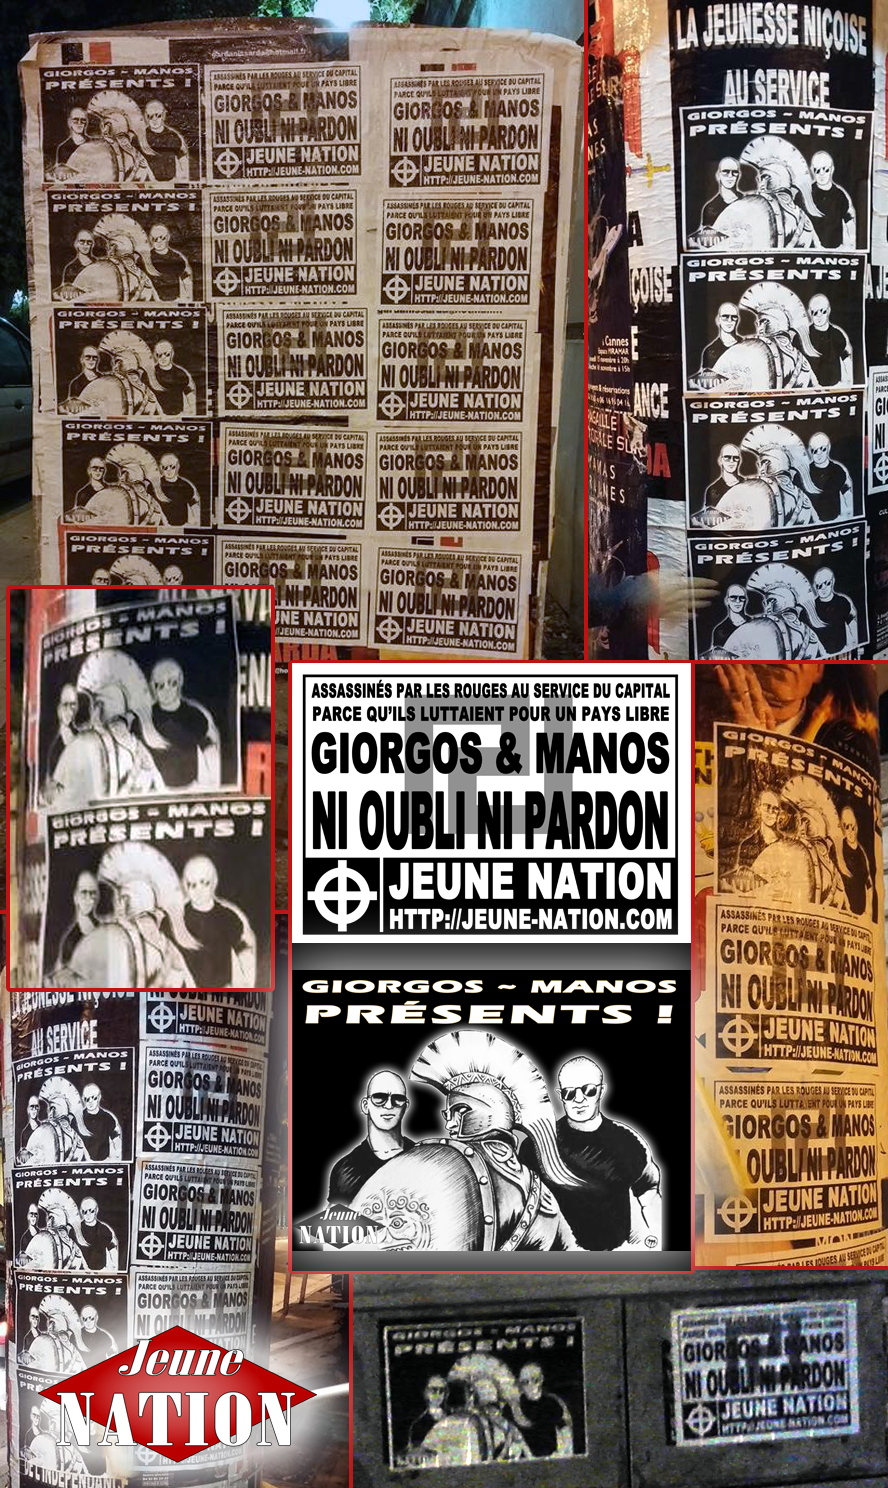 giorgos-manos-presents-01102014---4